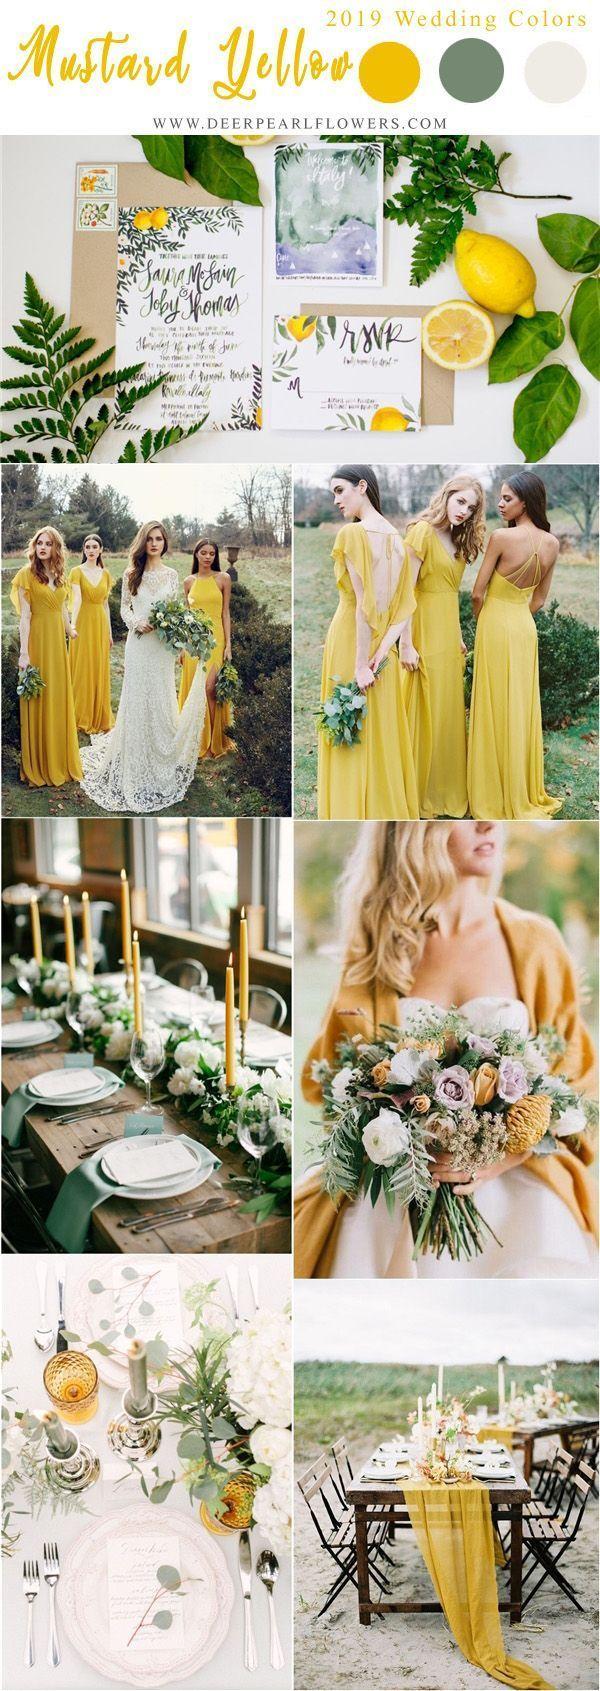 Top 10 Wedding Color Scheme Ideas for 2019 Trends